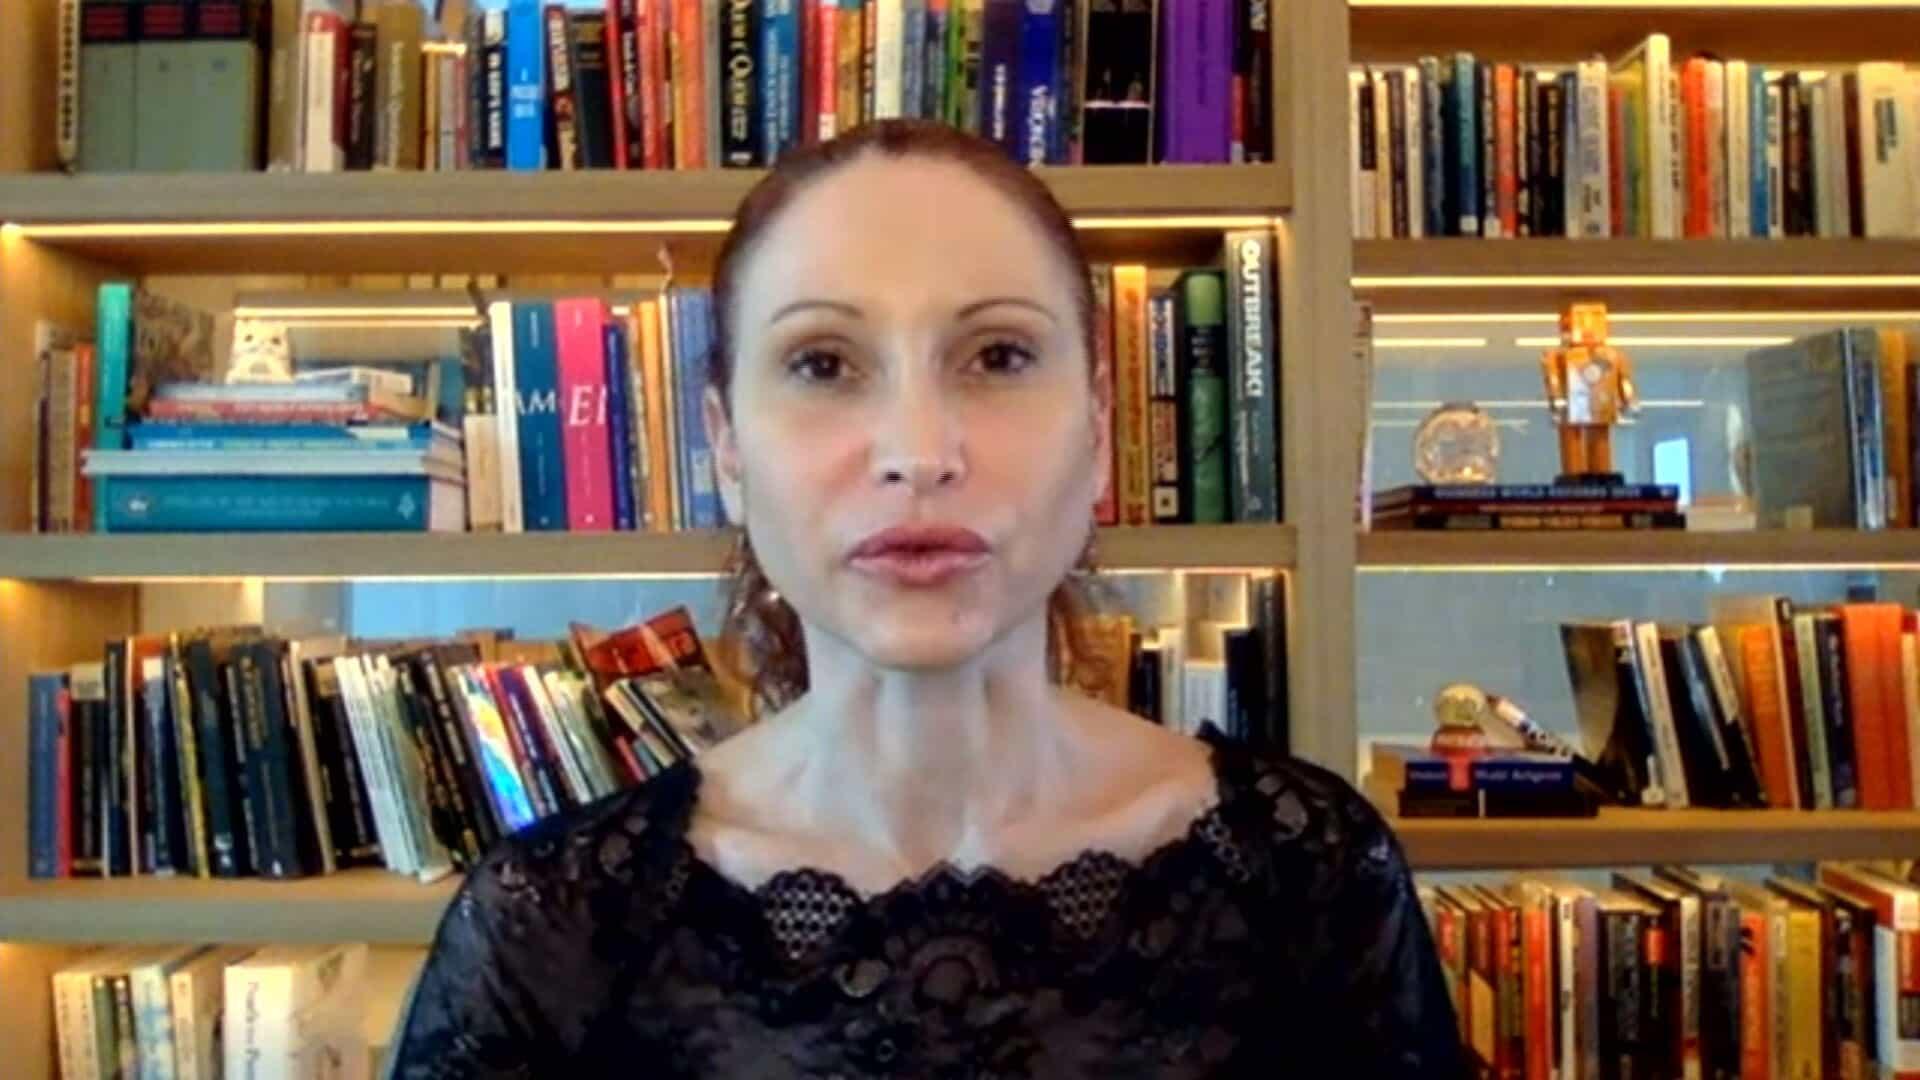 Mentira orquestrada pelo governo mata, afirma Natalia Pasternak à CPI